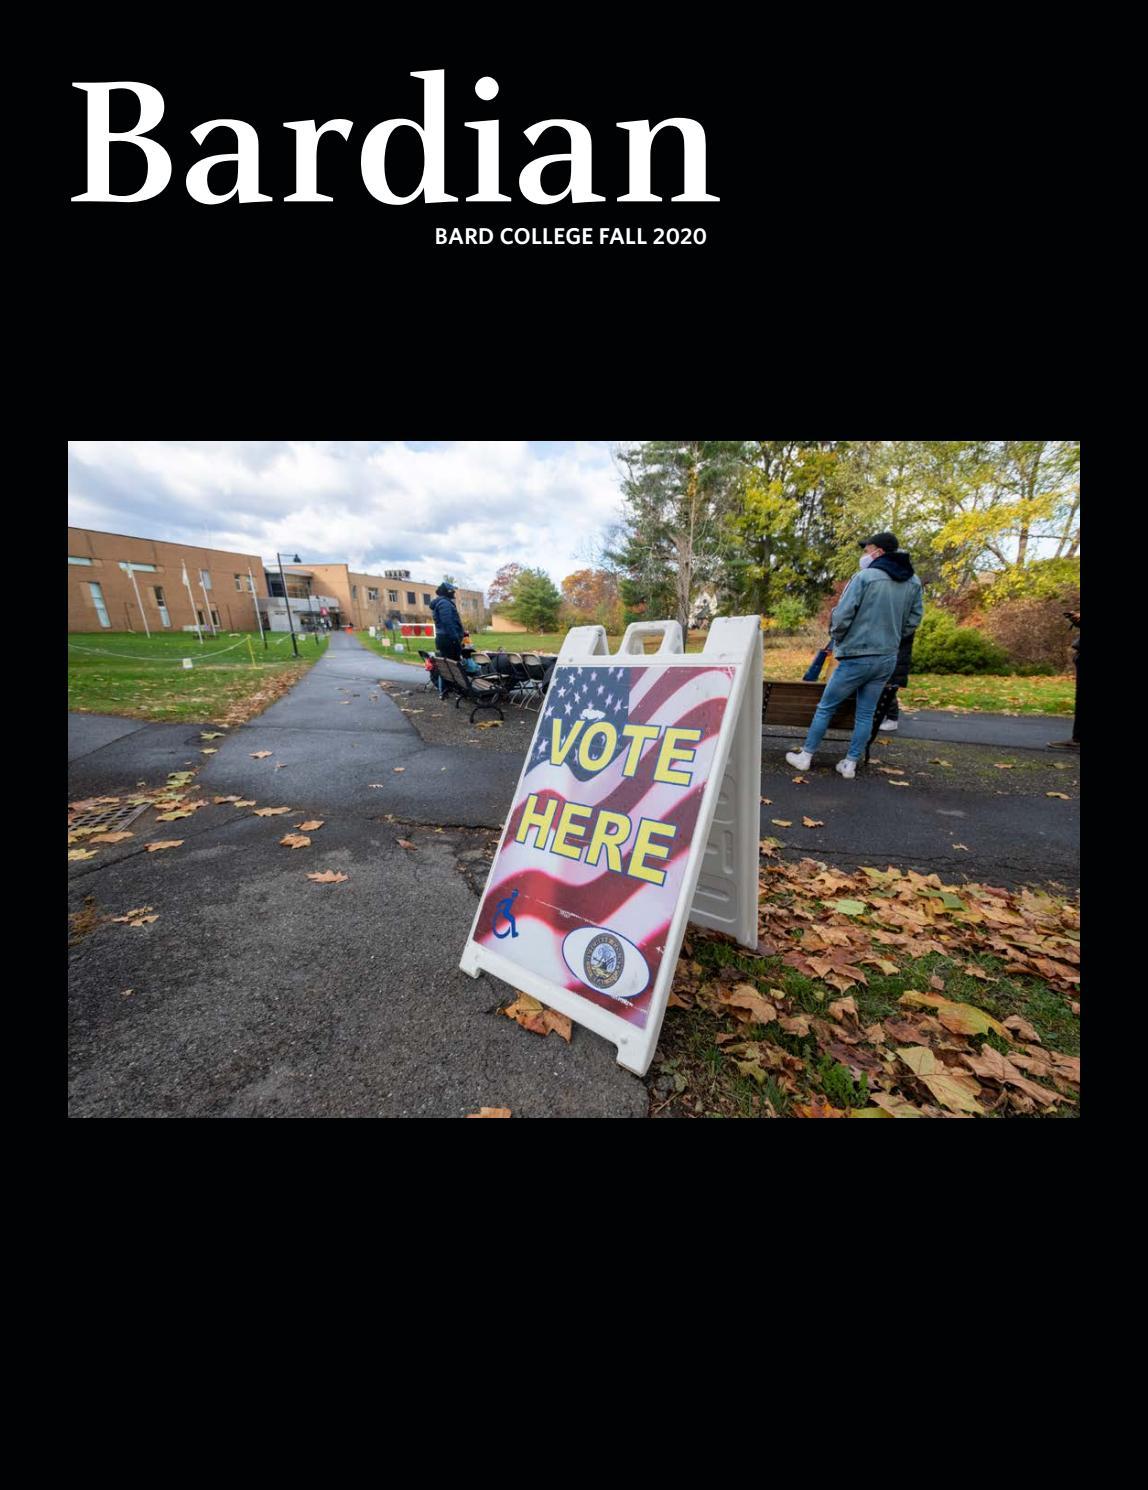 Winter 2020 Bardian By Bard College Bardian Issuu